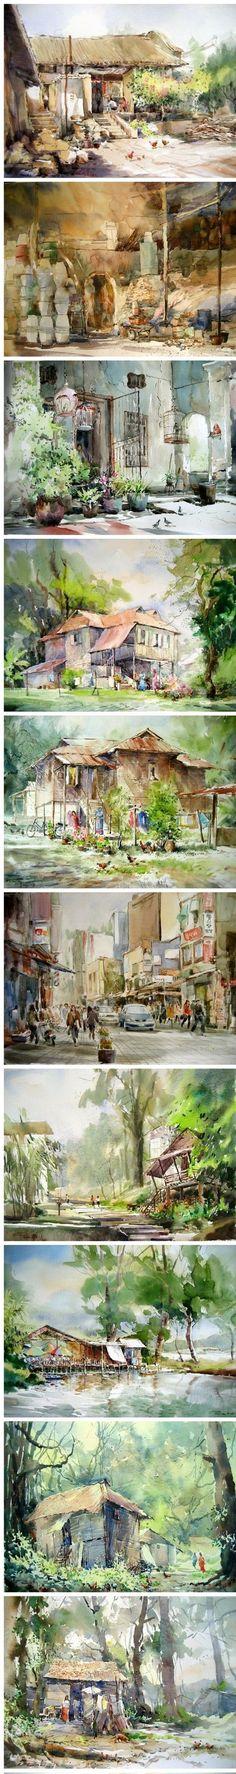 Incredible examples of watercolor paintings ► Phang Chew